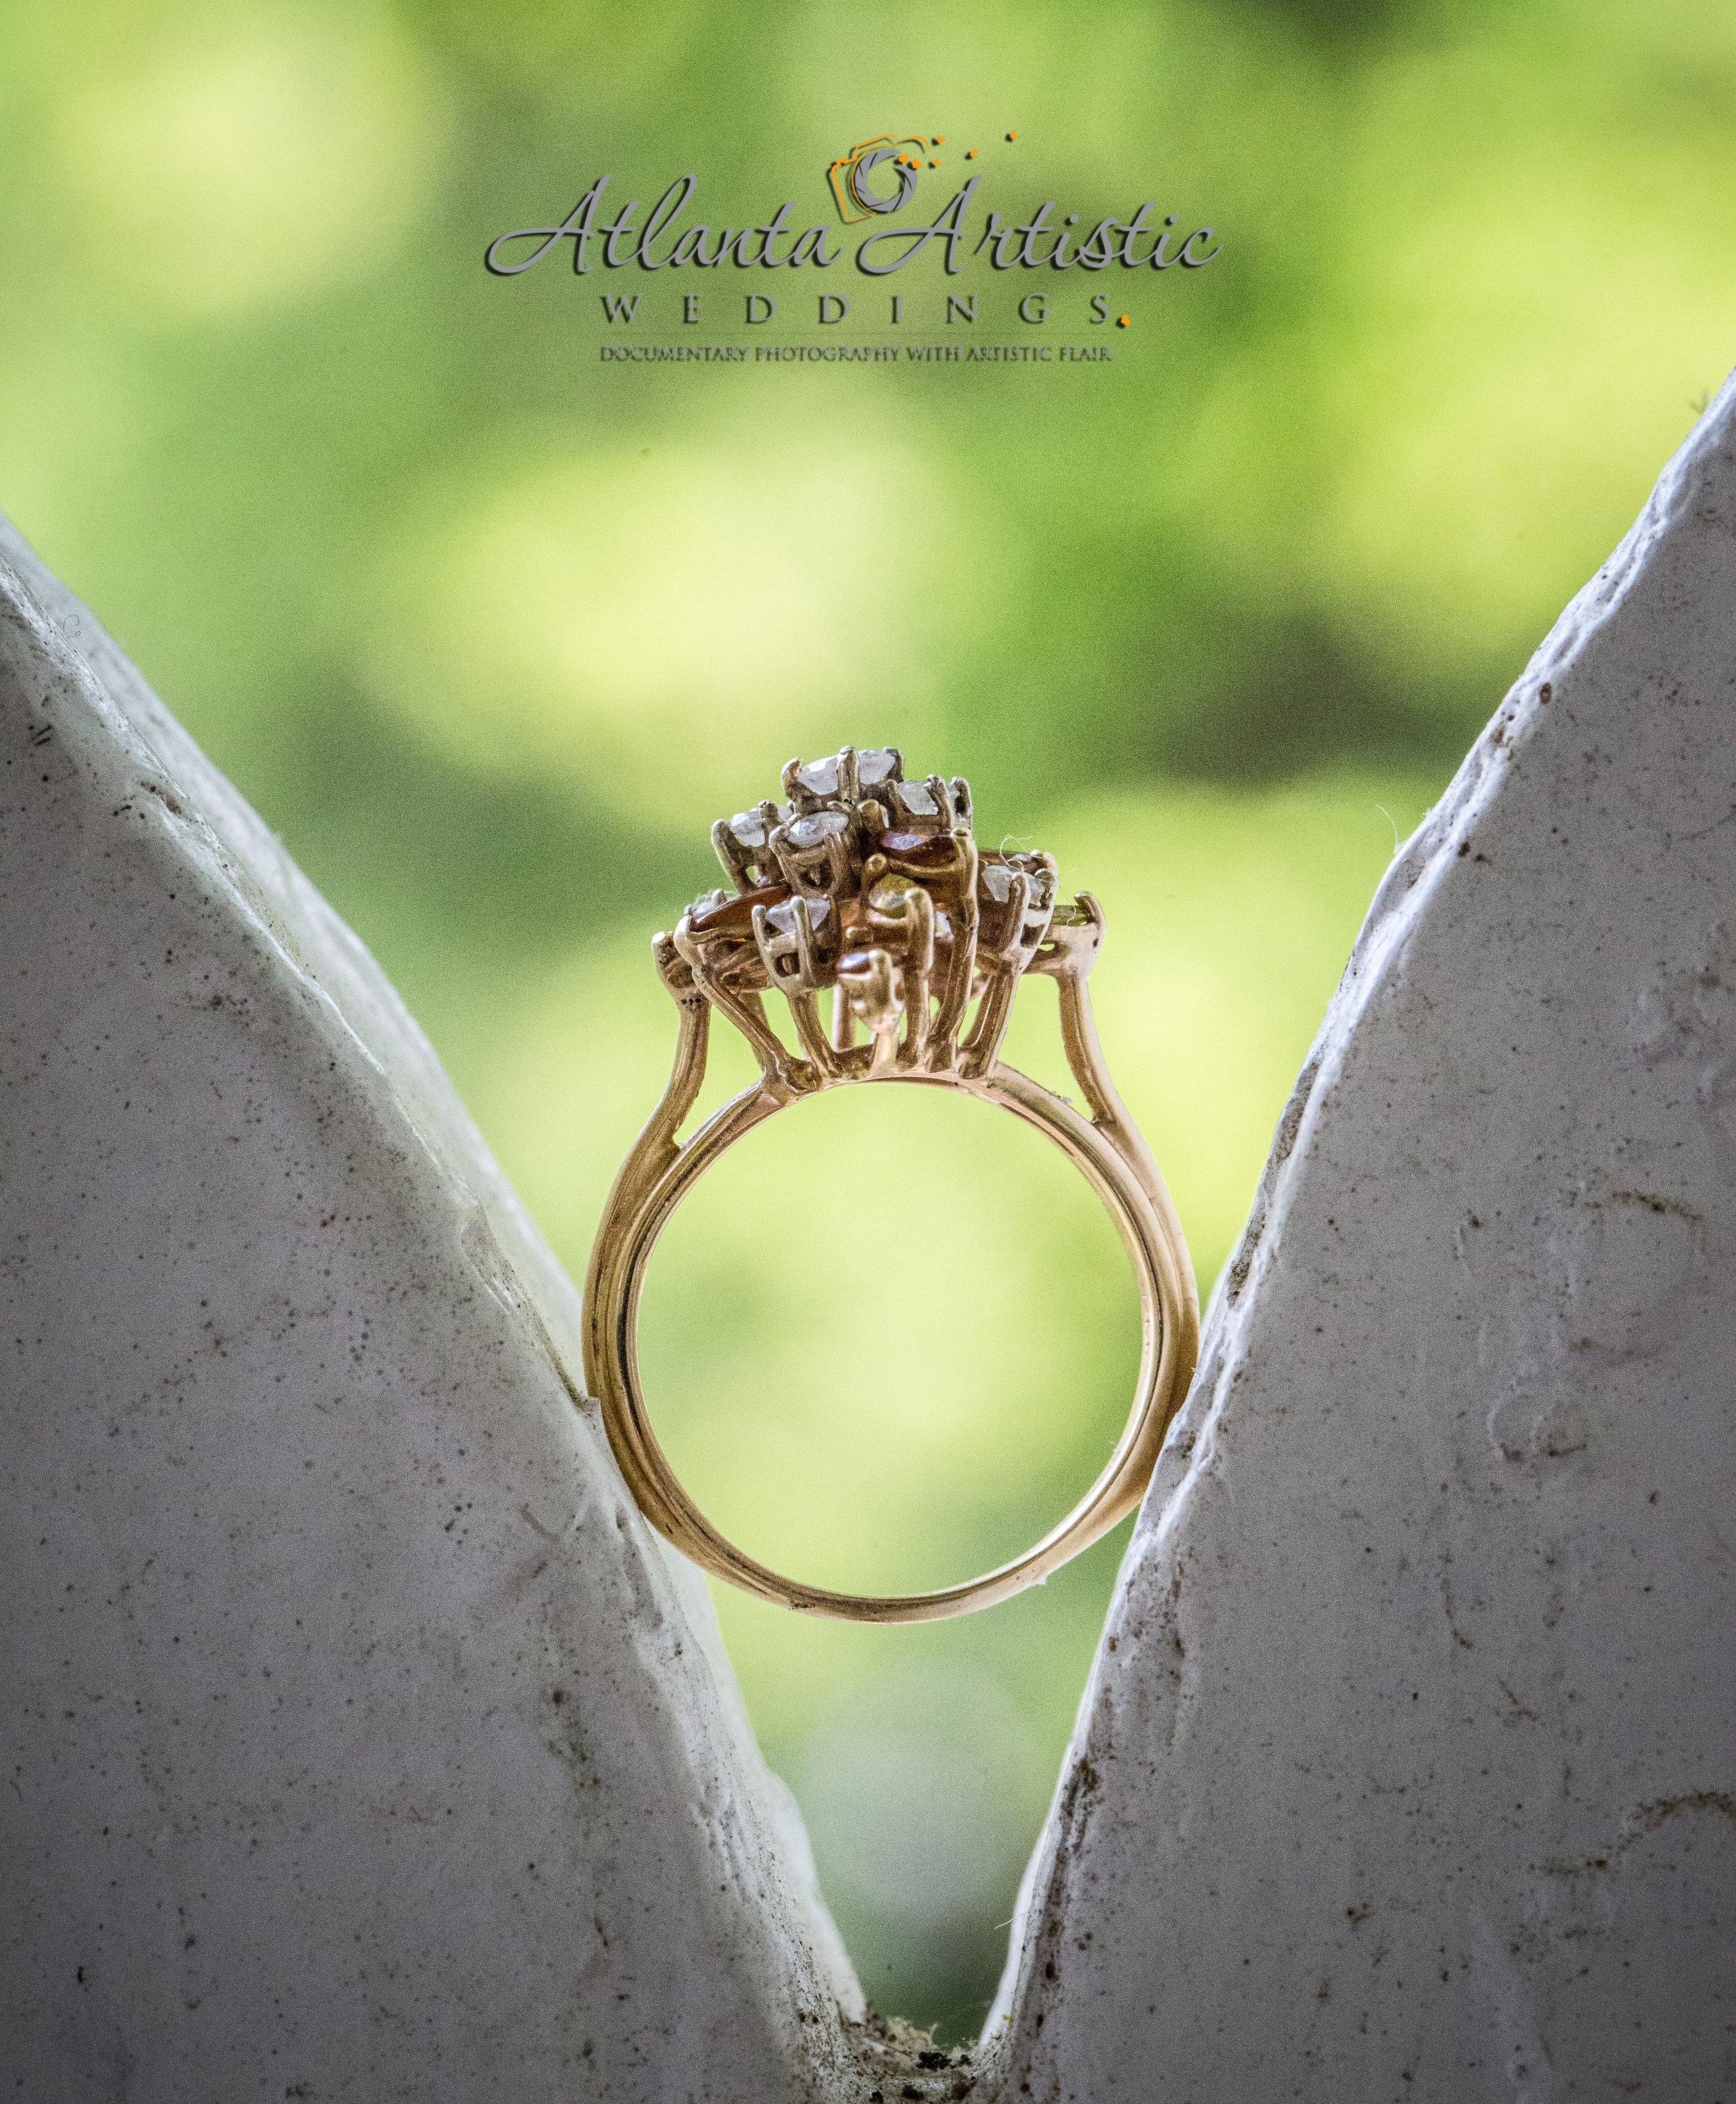 Atlanta Wedding Photographers use Gingerbread Detail of Historic Venue to Display Wedding Rings